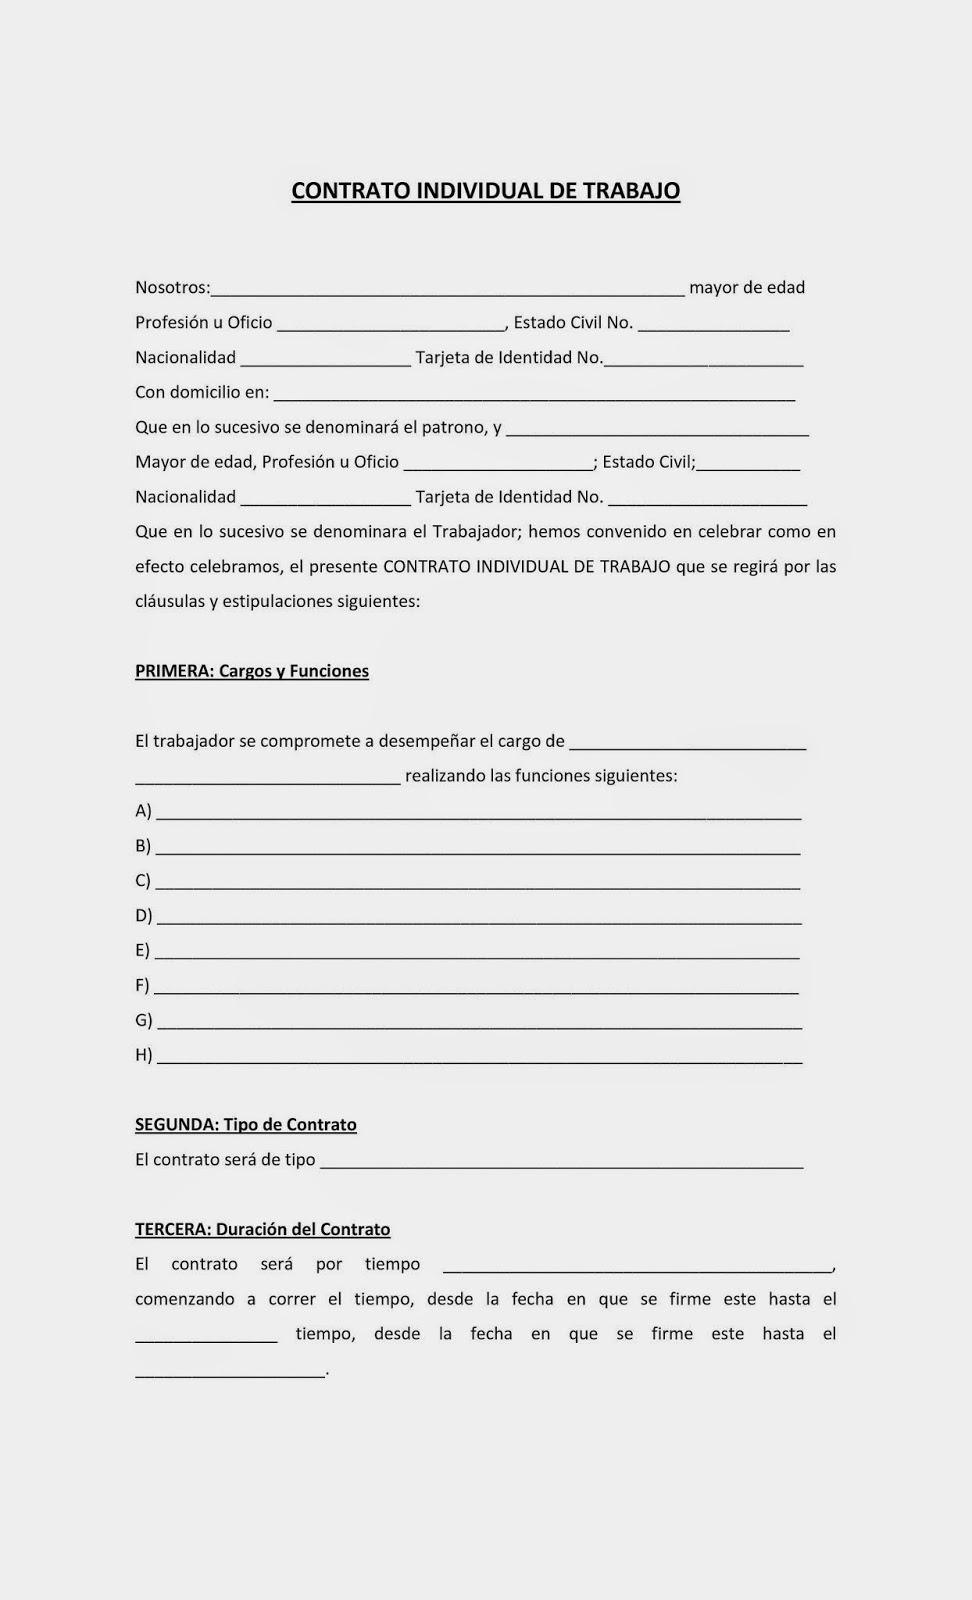 Admon Rec Hum Modulo V Submodulo Ii Contrato Individual De Trabajo